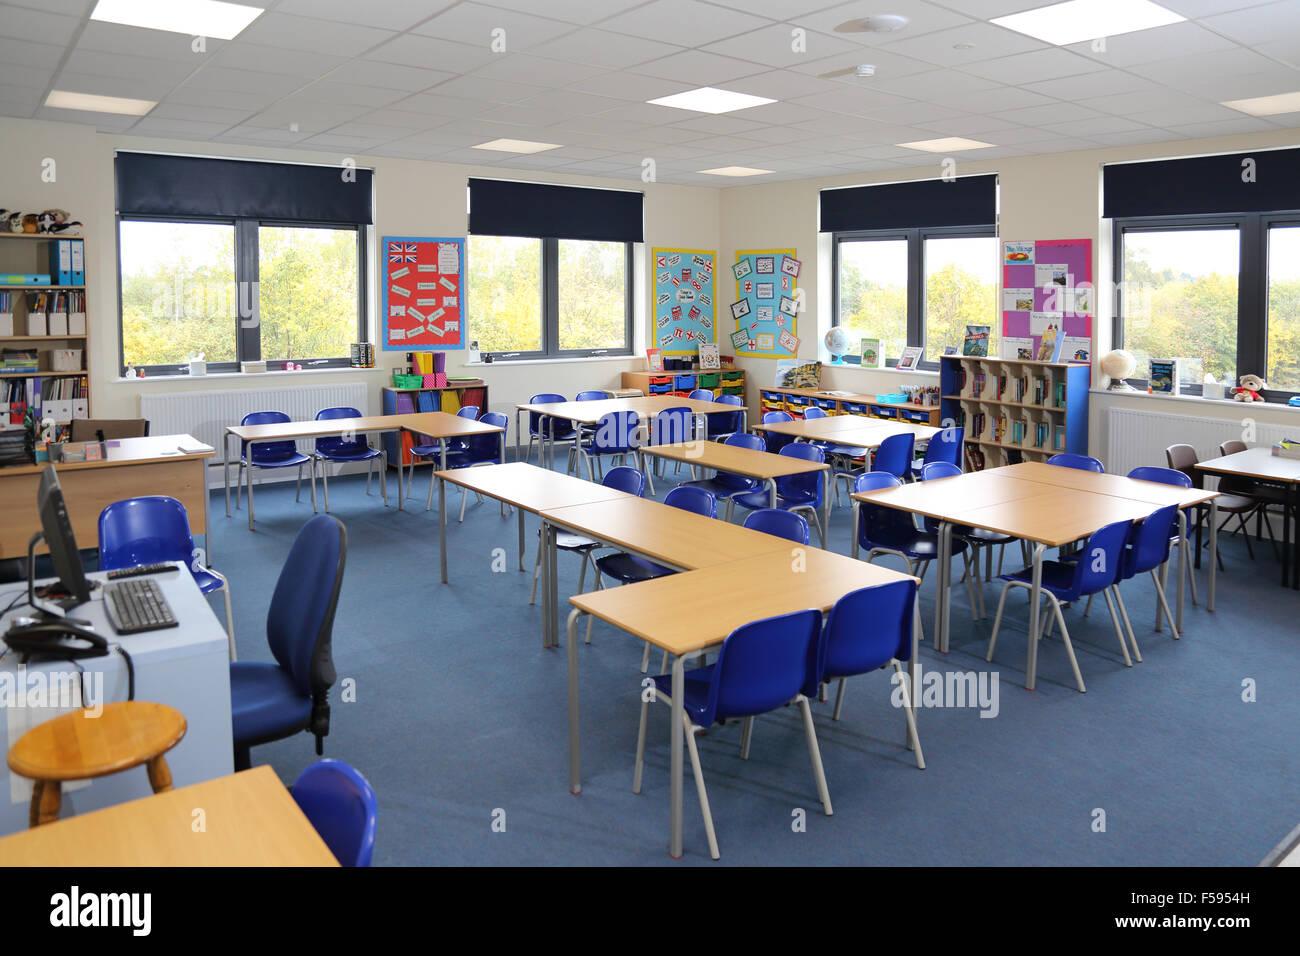 A Classroom In A Newly Built Uk Junior School Shows Desks